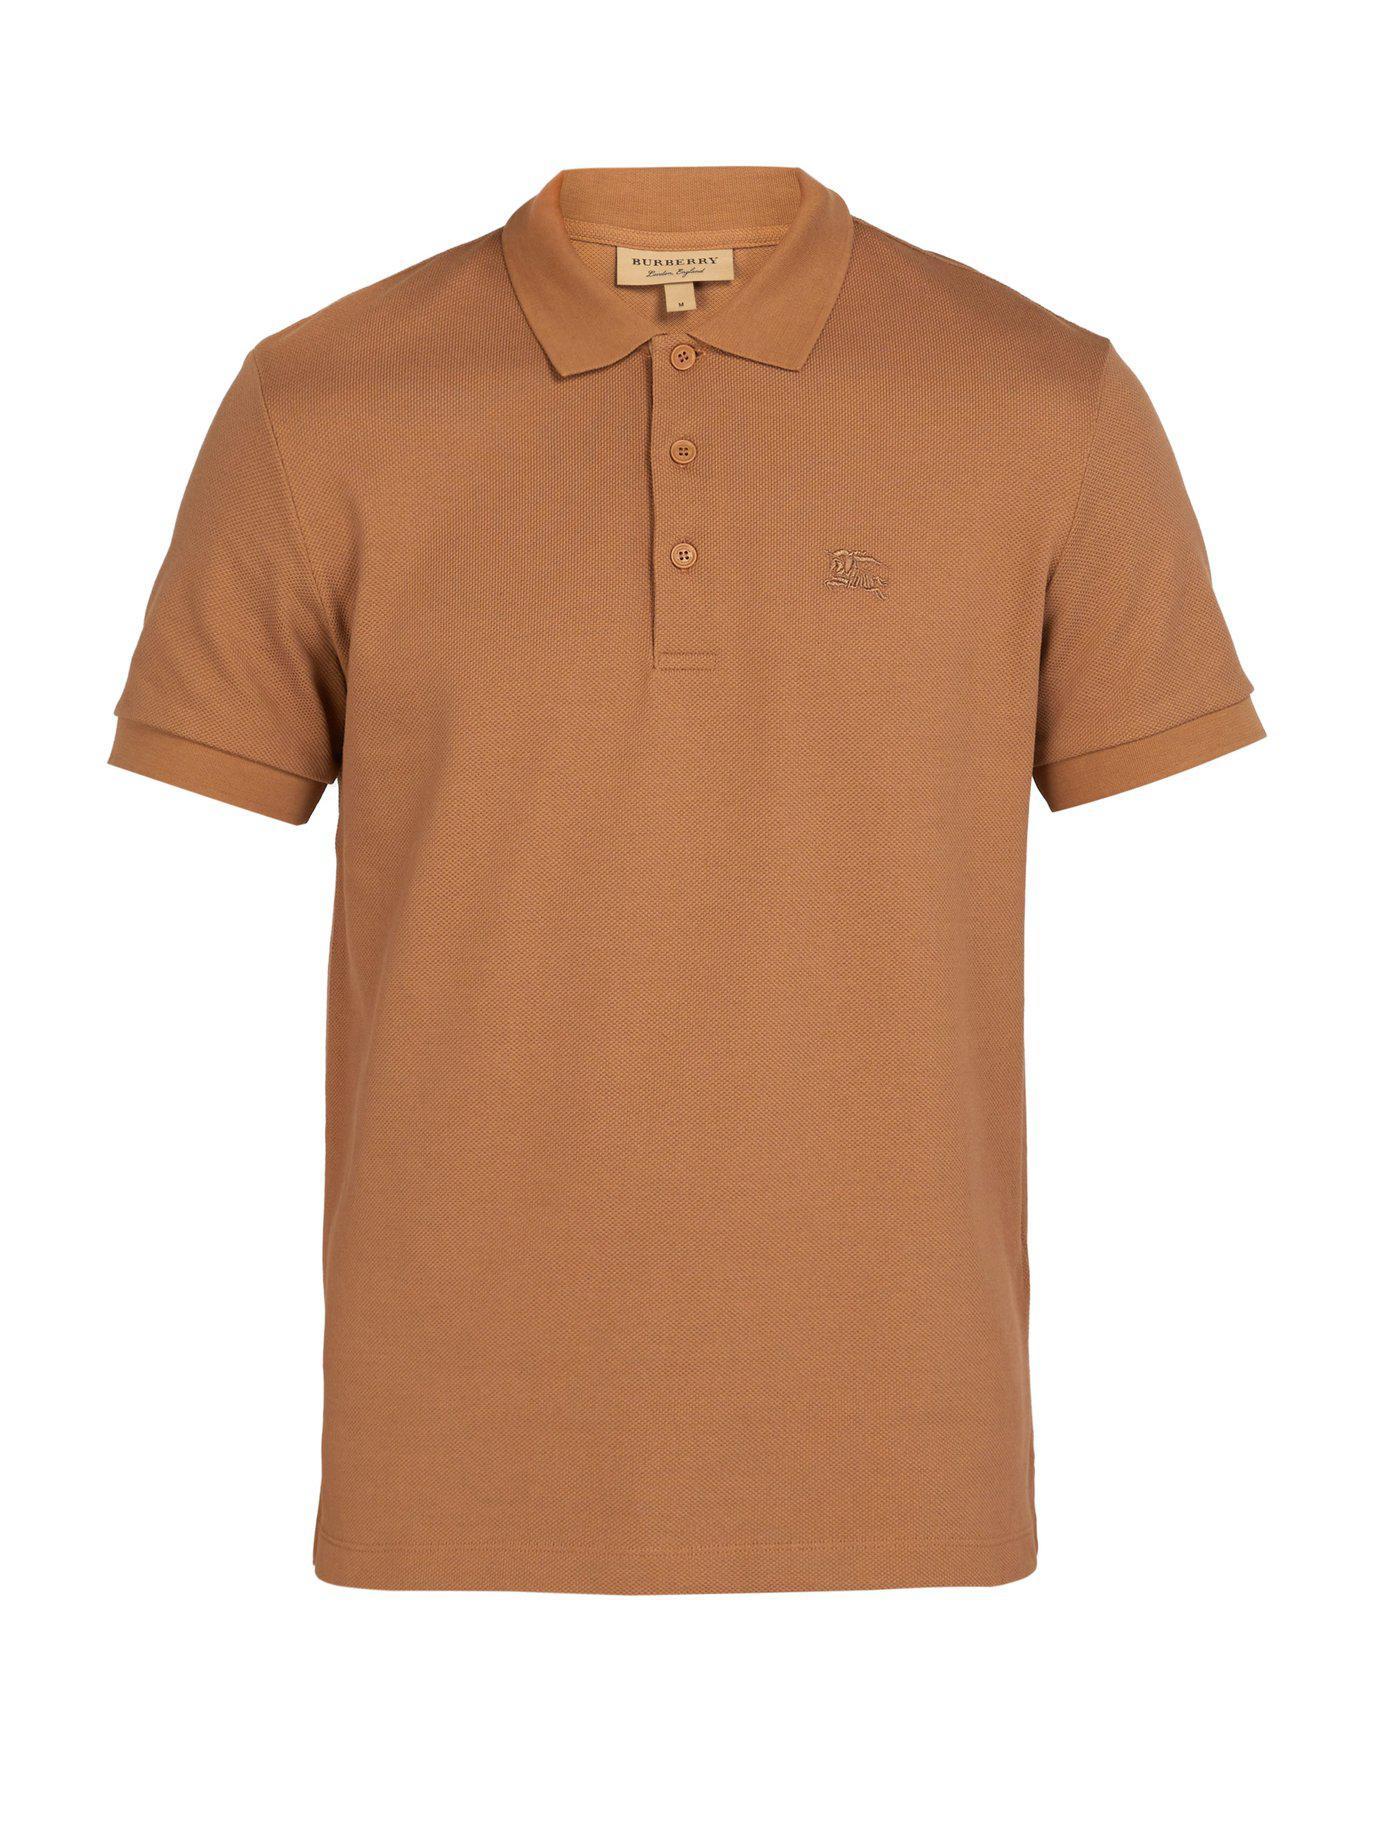 fca25fbfc1fc Burberry - Multicolor Logo Embroidered Cotton Piqué Polo Shirt for Men -  Lyst. View fullscreen